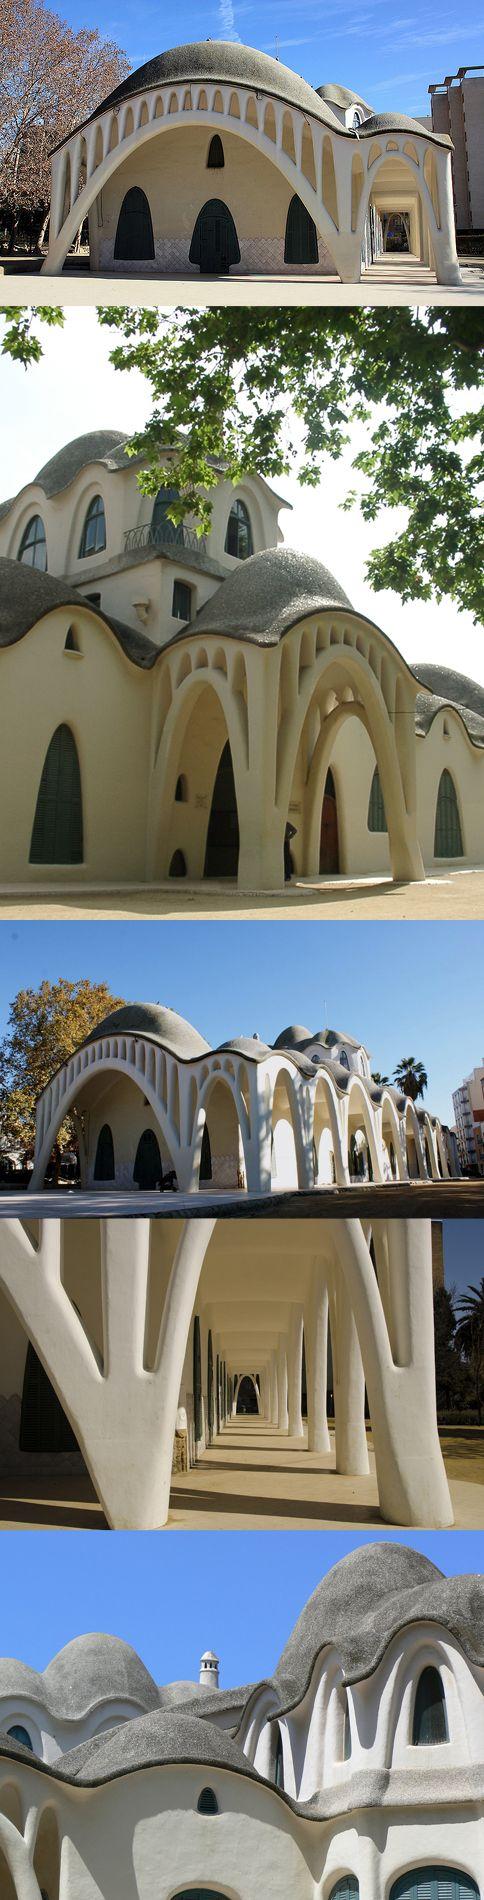 Masia Freixa by Lluís Muncunill in #Terrassa, #Barcelona